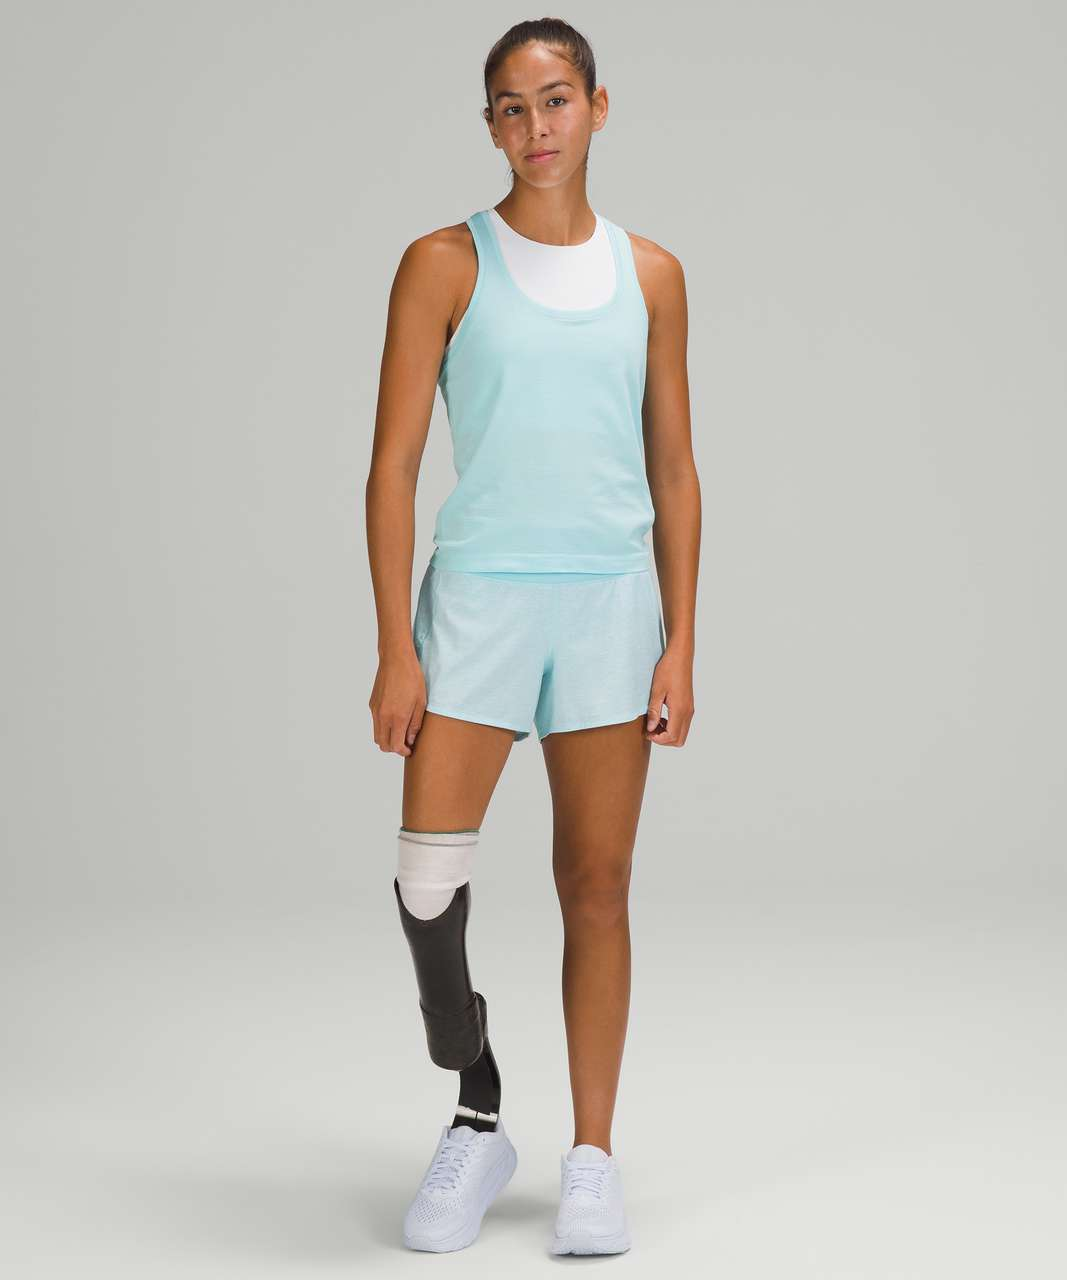 "Lululemon Speed Up Mid-Rise Short 4"" - Heather Lux Multi Icing Blue / Icing Blue"